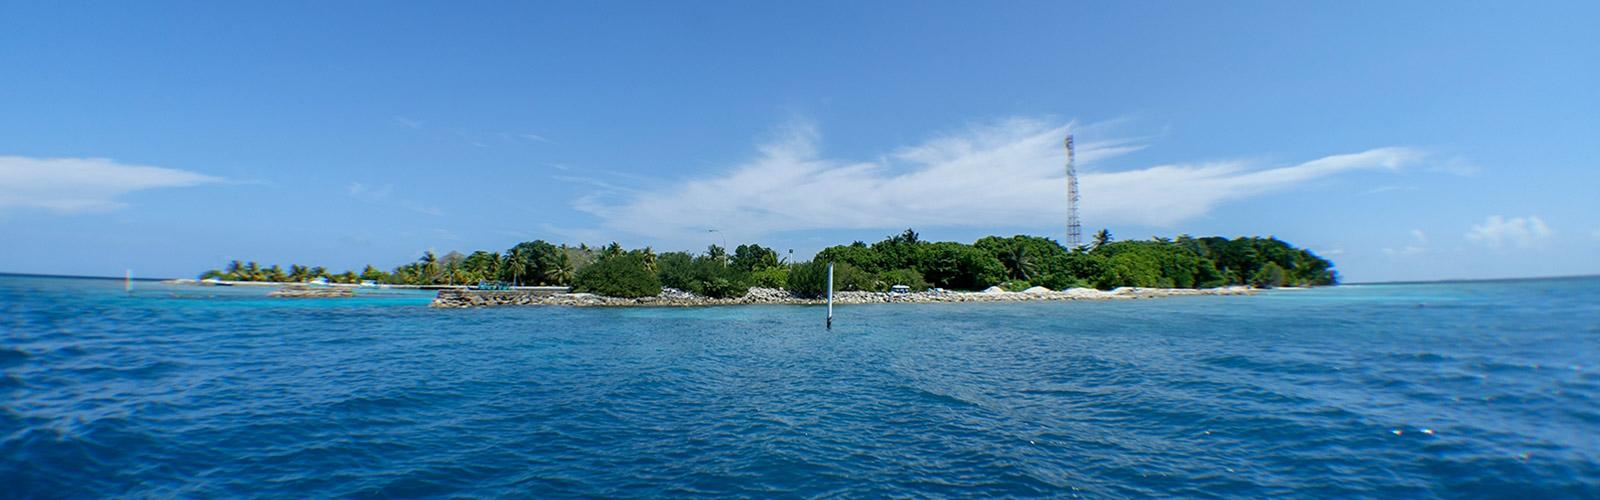 Maldives Island excursion